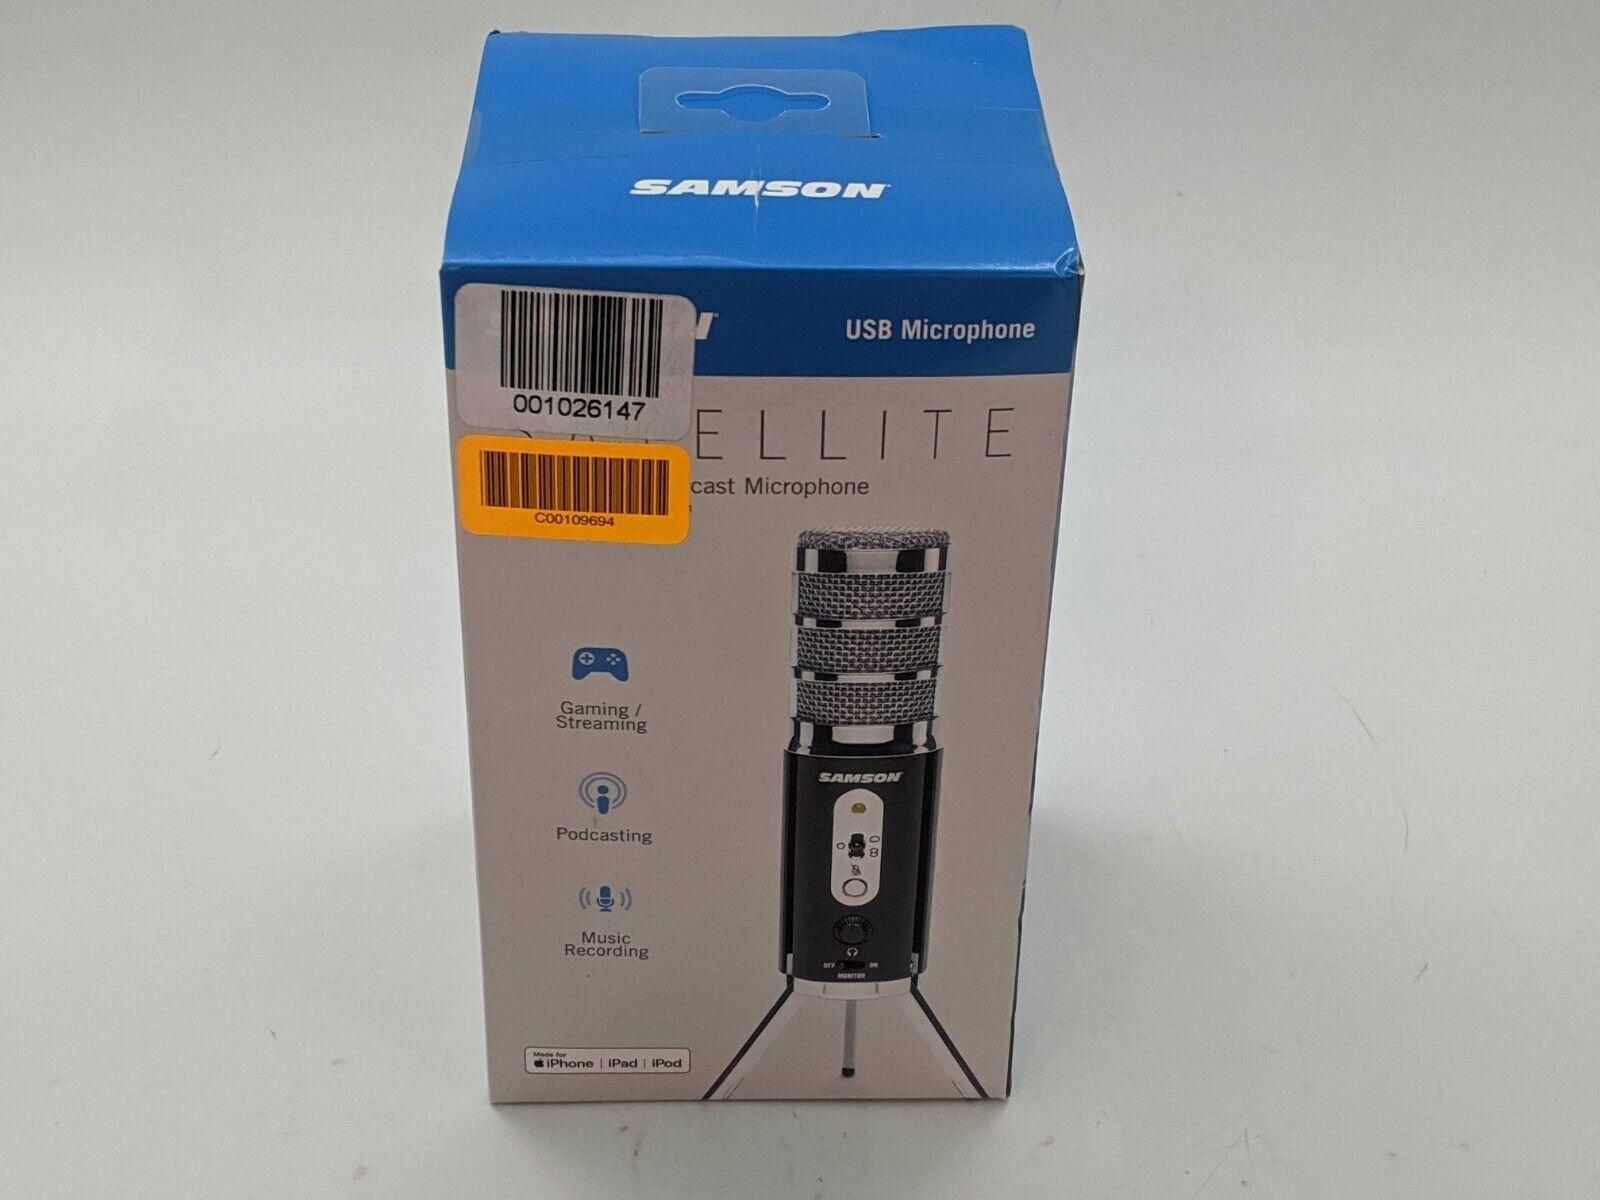 Samson Satellite Recording USB/iOS Microphone Computer iPad